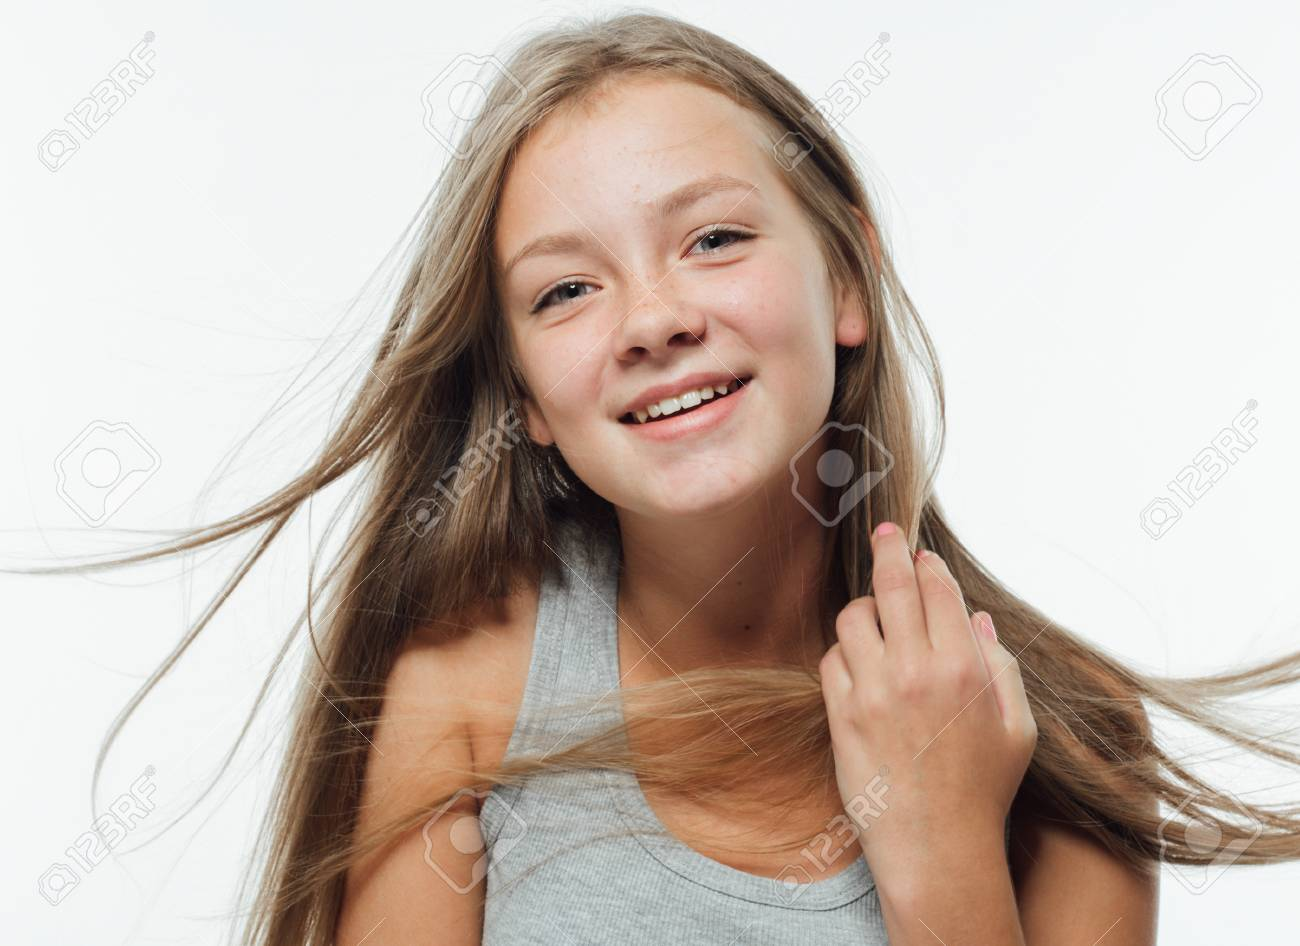 Cute teenage girl freckles woman face closeup portrait with healthy skin. Studio shot. - 79345726